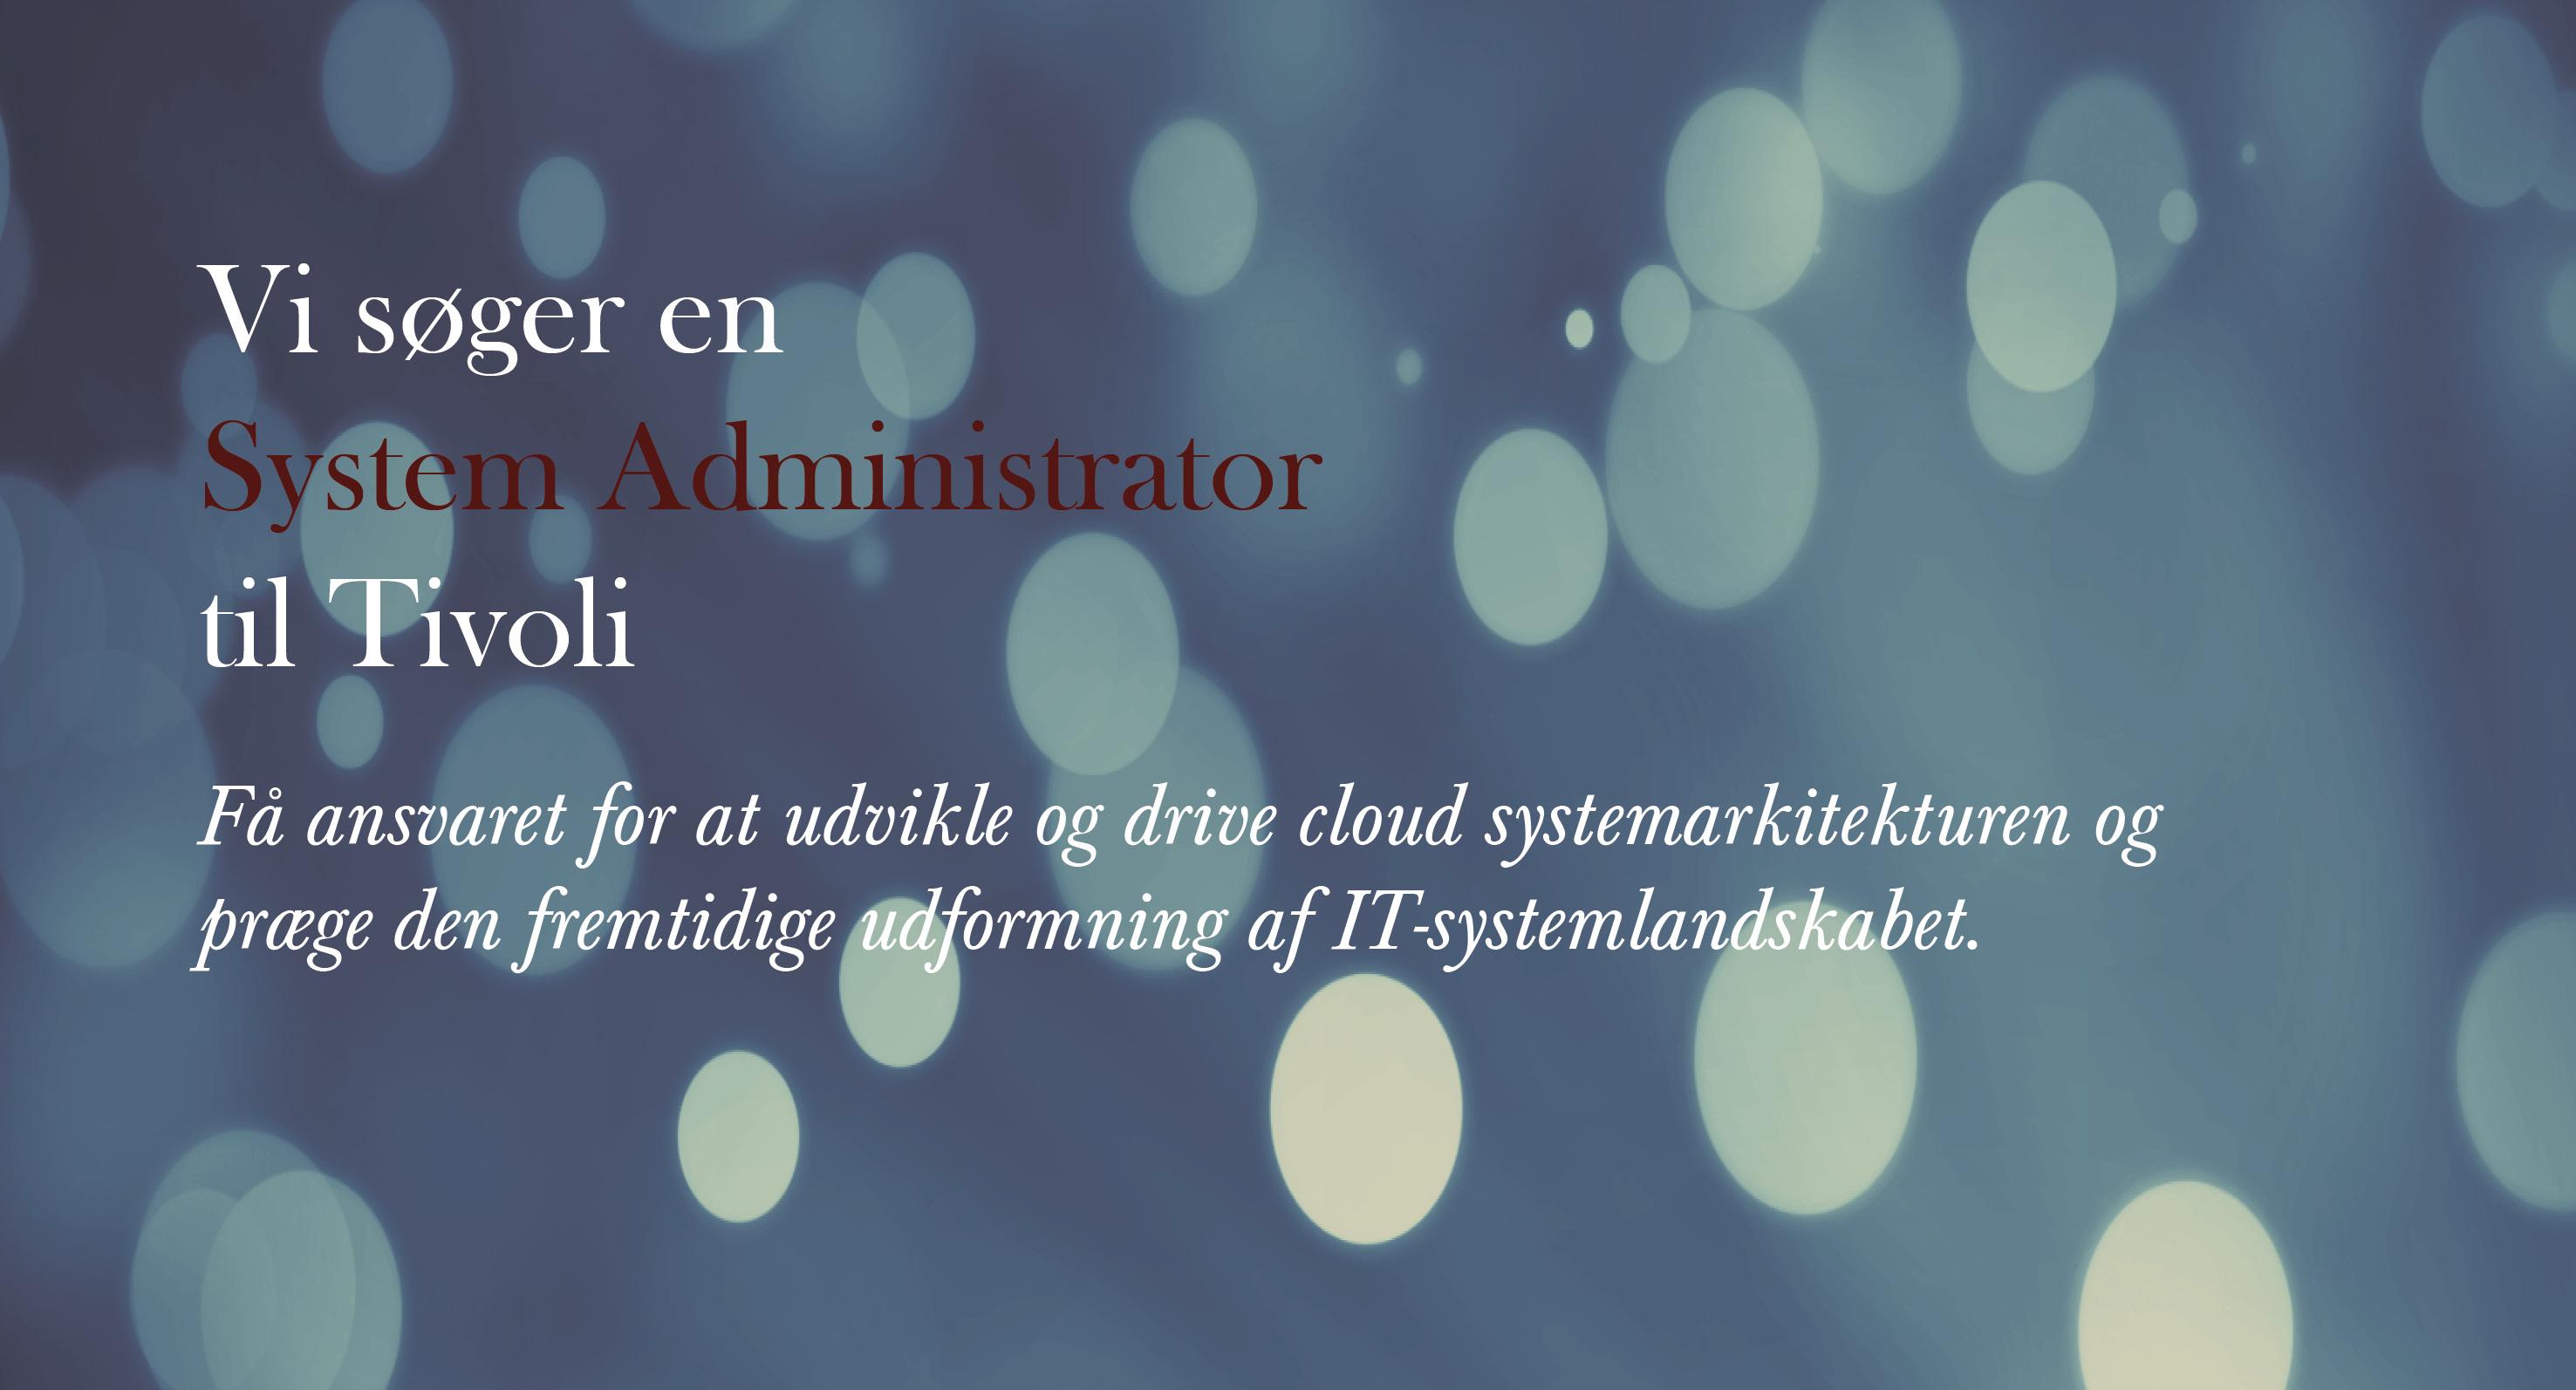 System Administrator - Tivoli